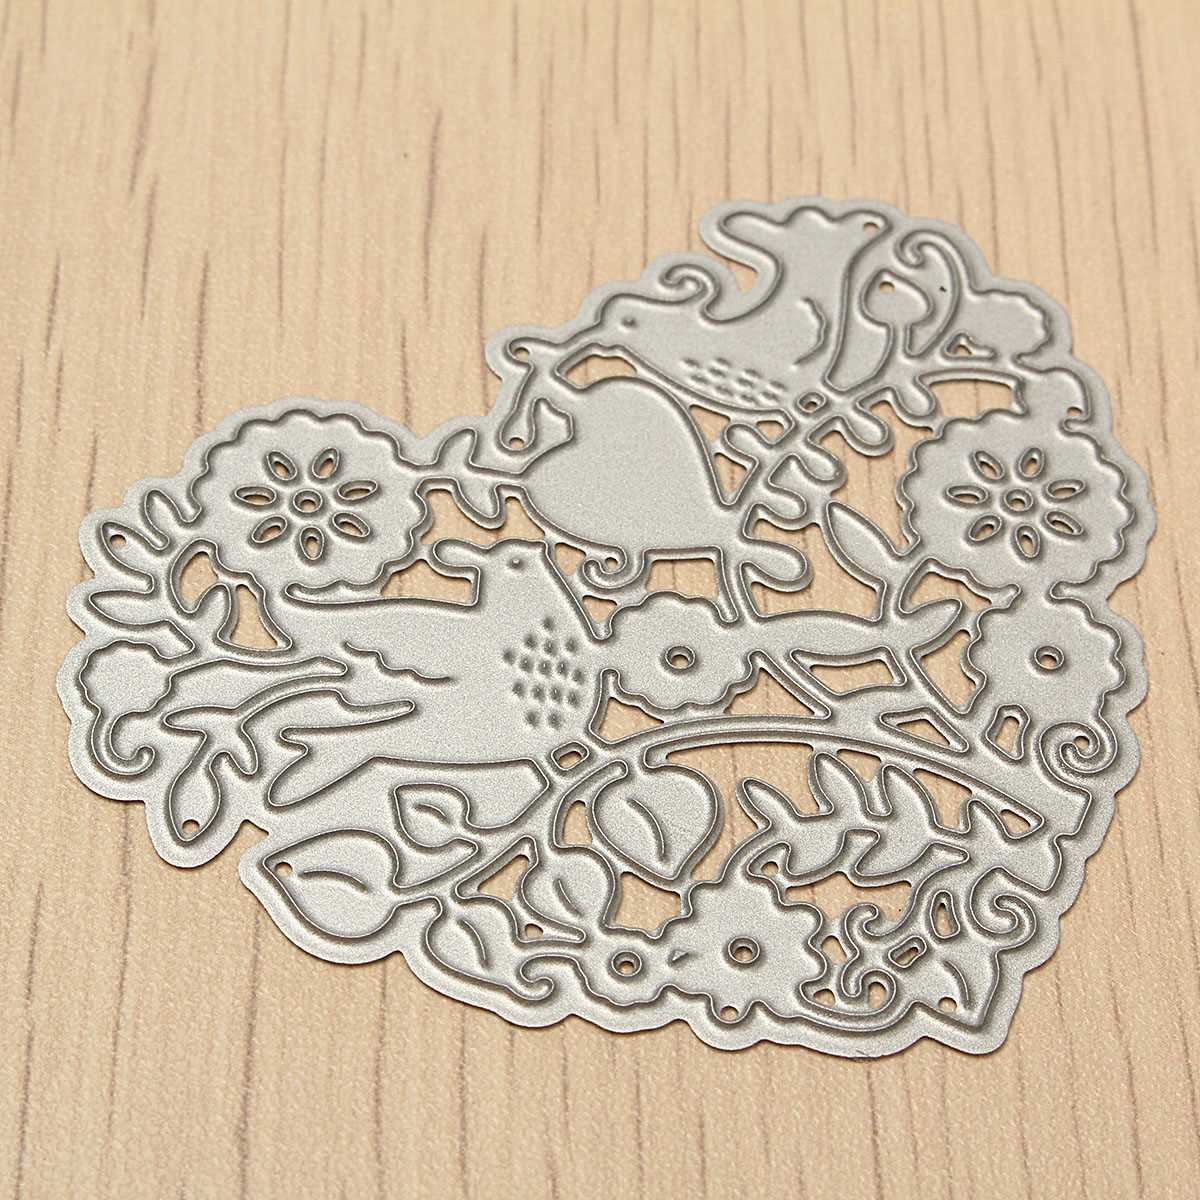 Diy heart flower die cutting dies stencil scrapbooking for Dies for paper crafting